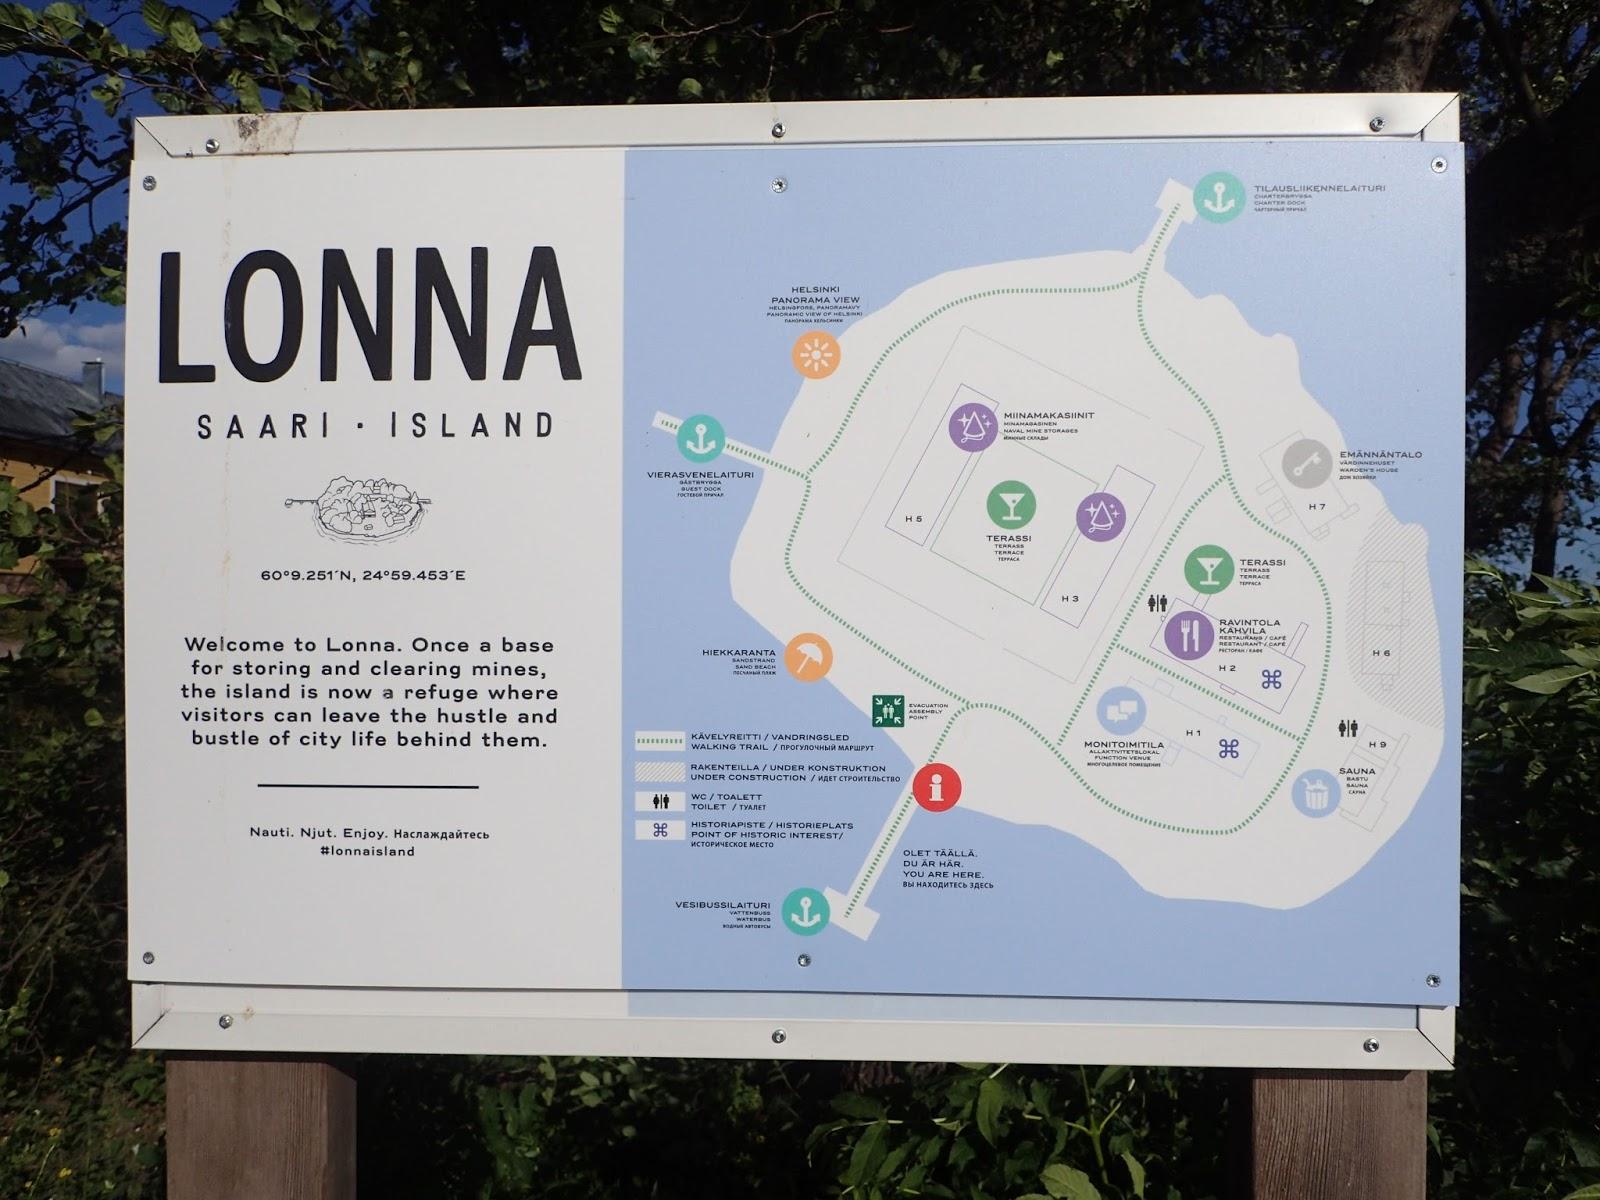 Lonna, Helsinki